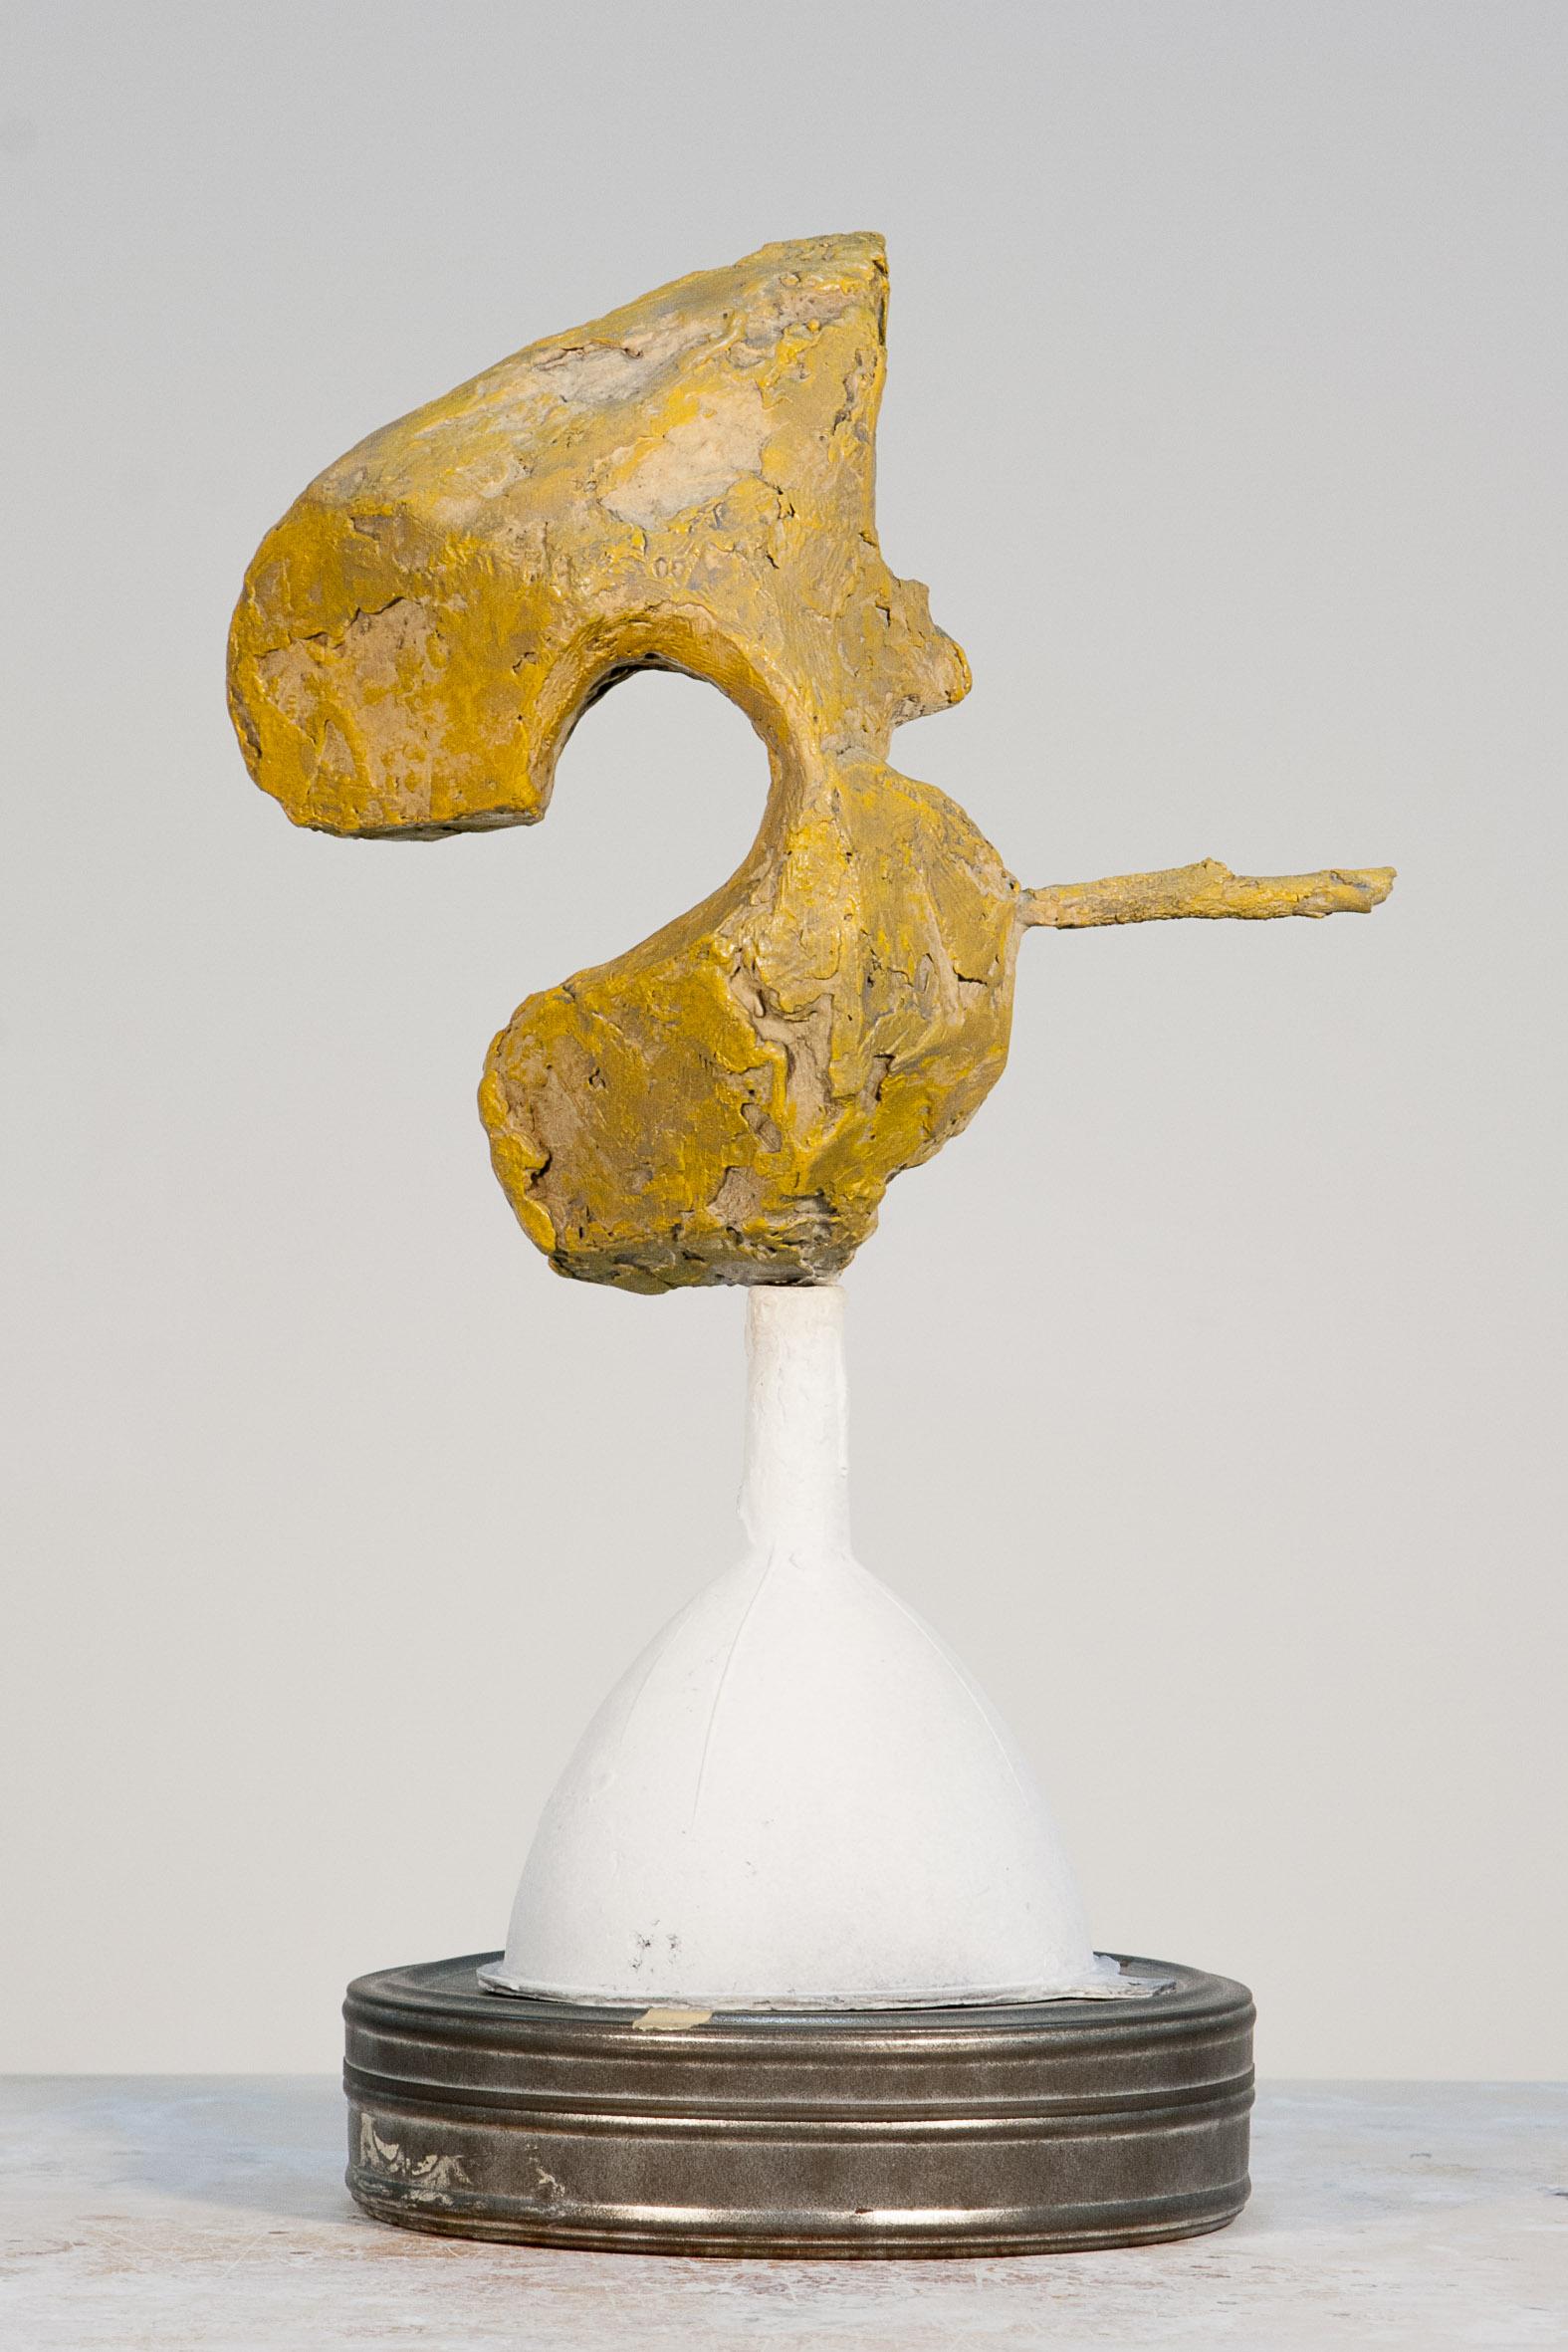 imbibe,2017, patinated bronze,30 x 20 x 14cm